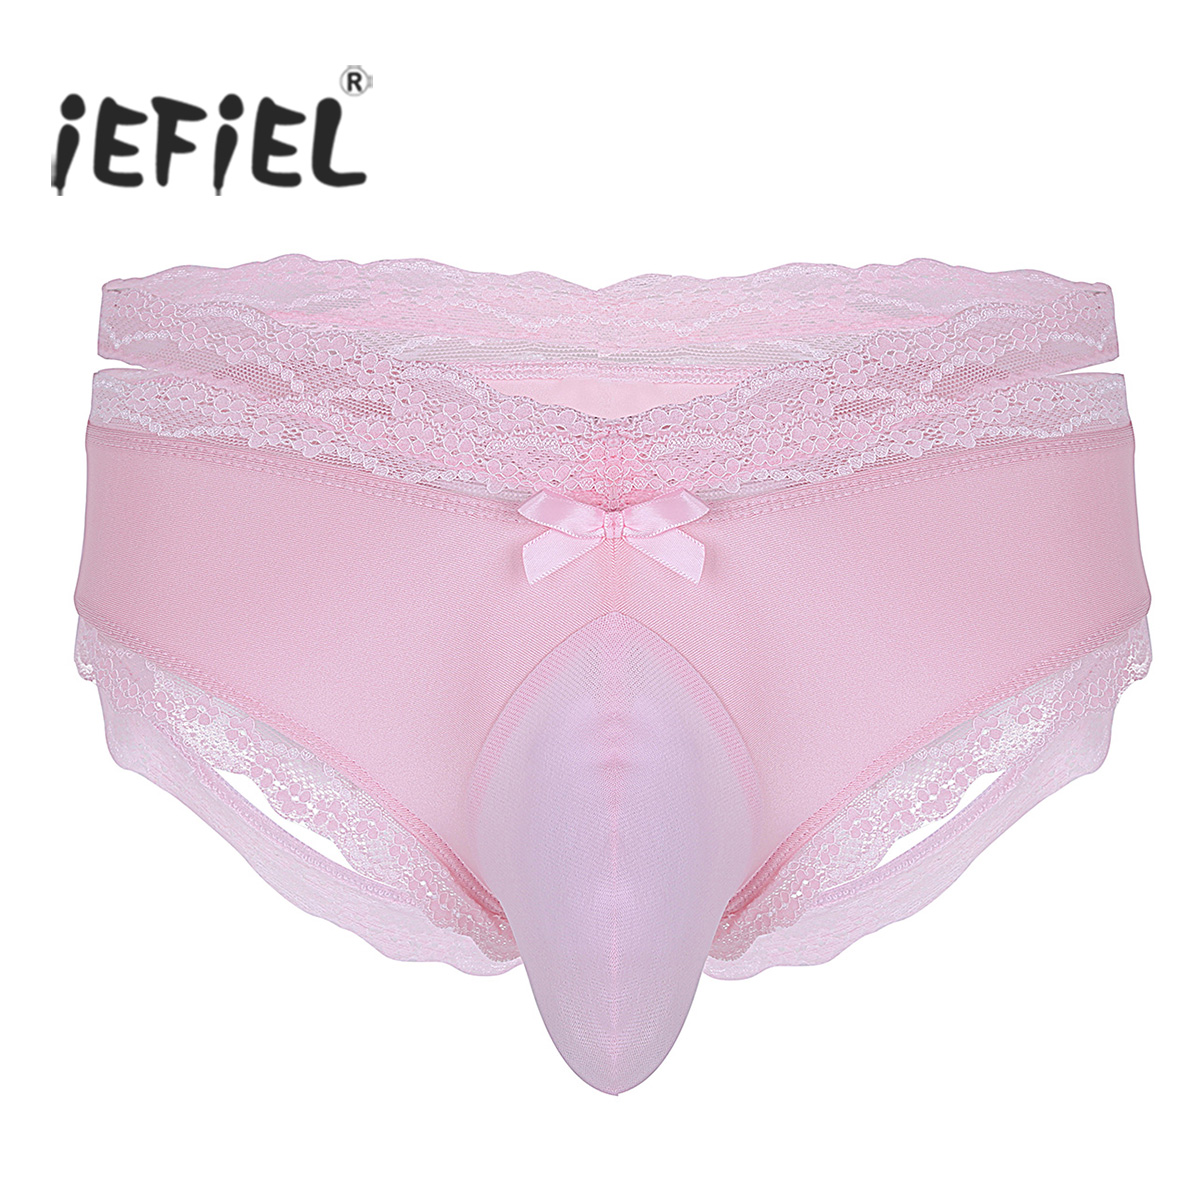 Buy Mens Lingerie Sexy Panties Low Rise Open Back Lace Floral Bulge Pouch Sissy Jockstraps Briefs Gay Male Underwear Underpants